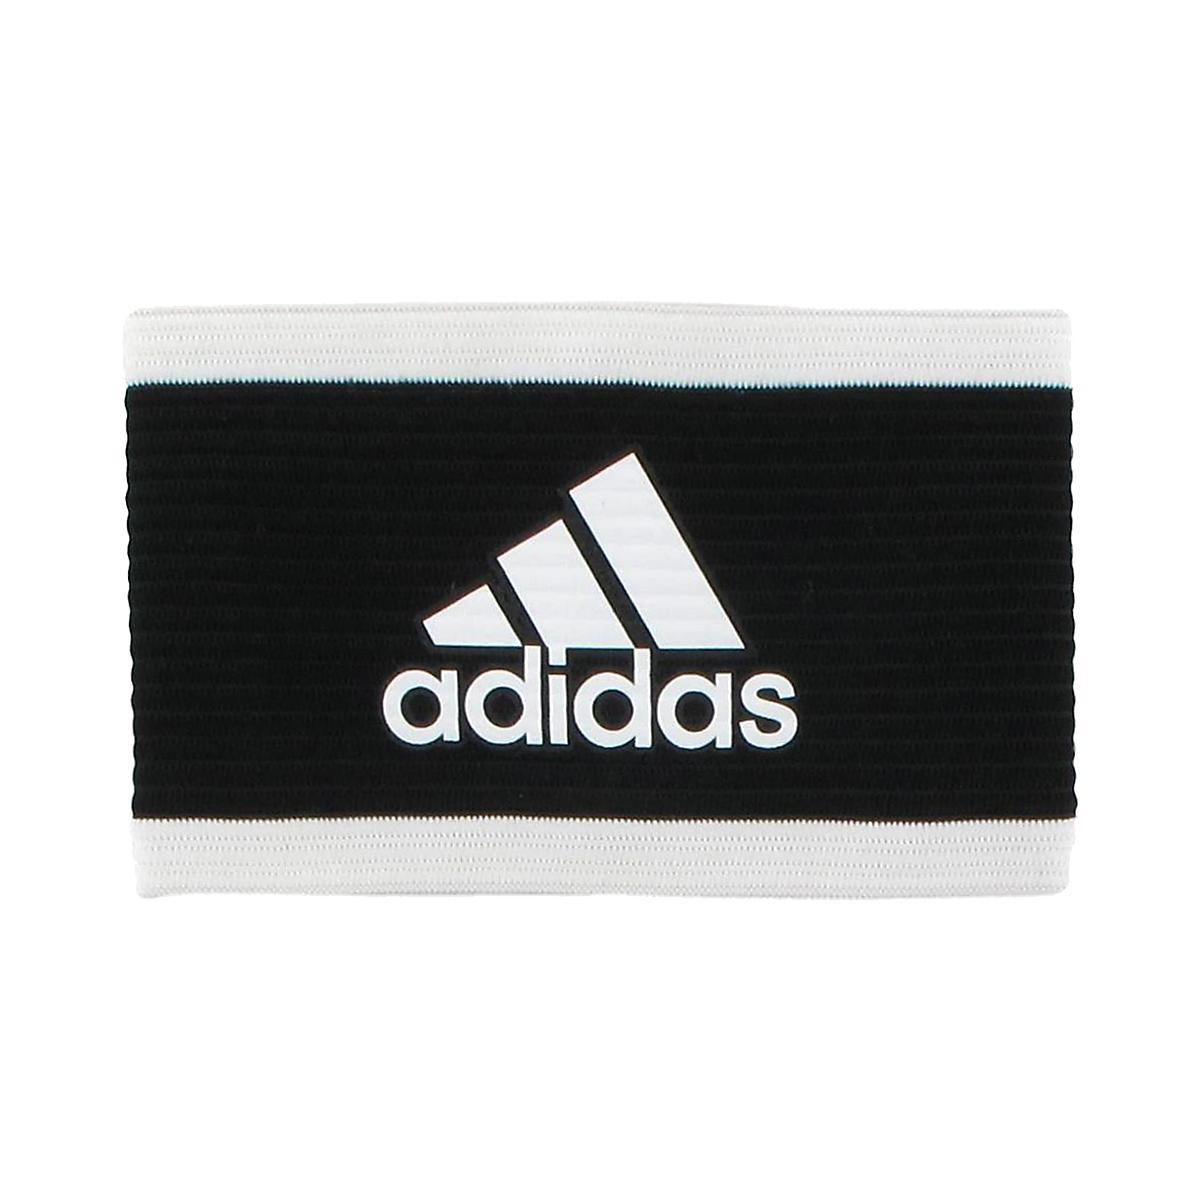 adidas�Captains Armband III